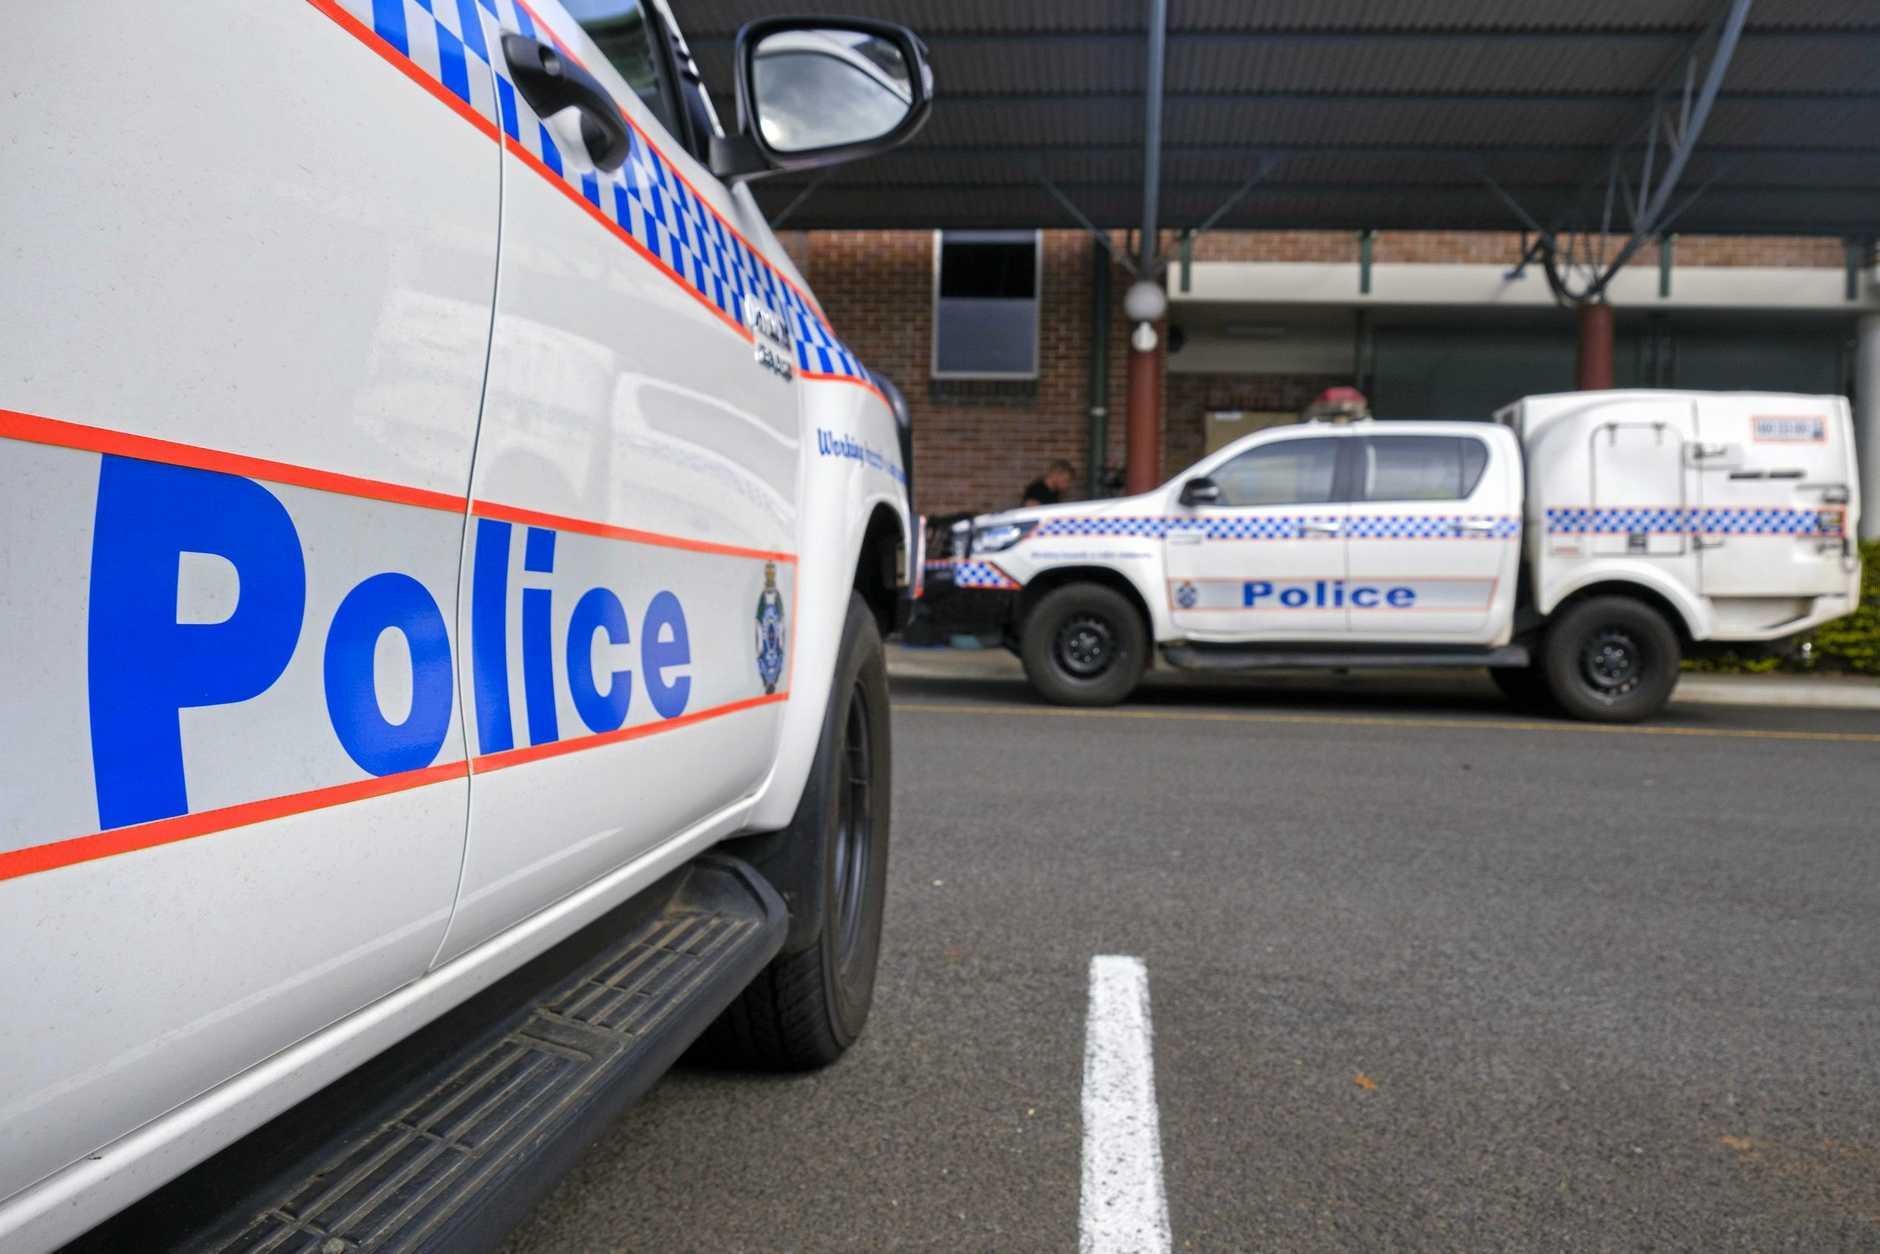 Police have arrested two men.